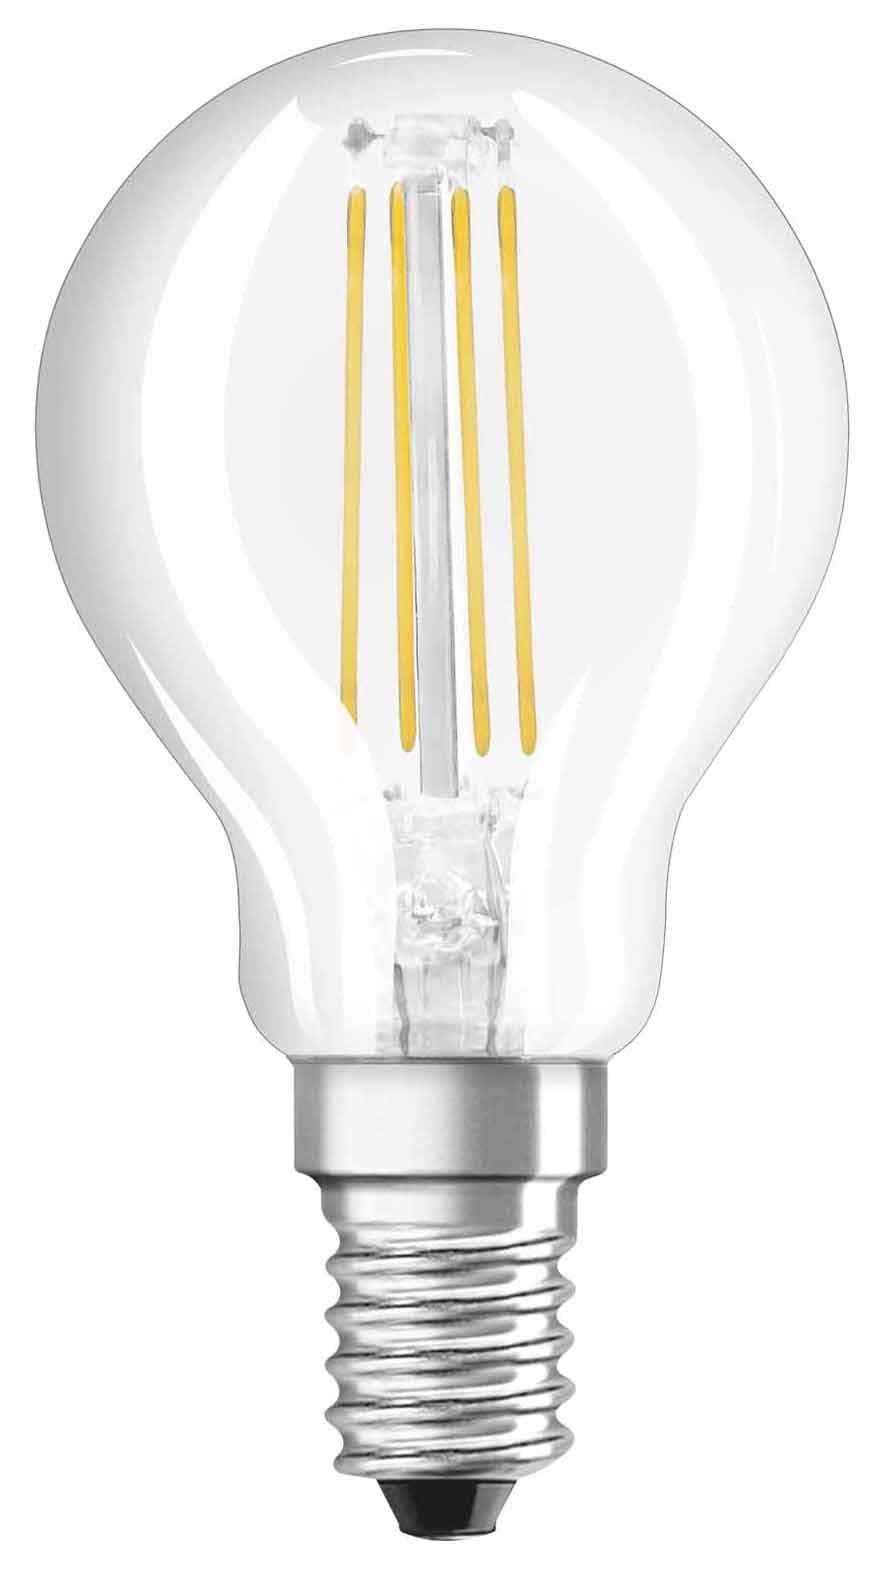 osram led e14 40w filament cl p40 migros. Black Bedroom Furniture Sets. Home Design Ideas